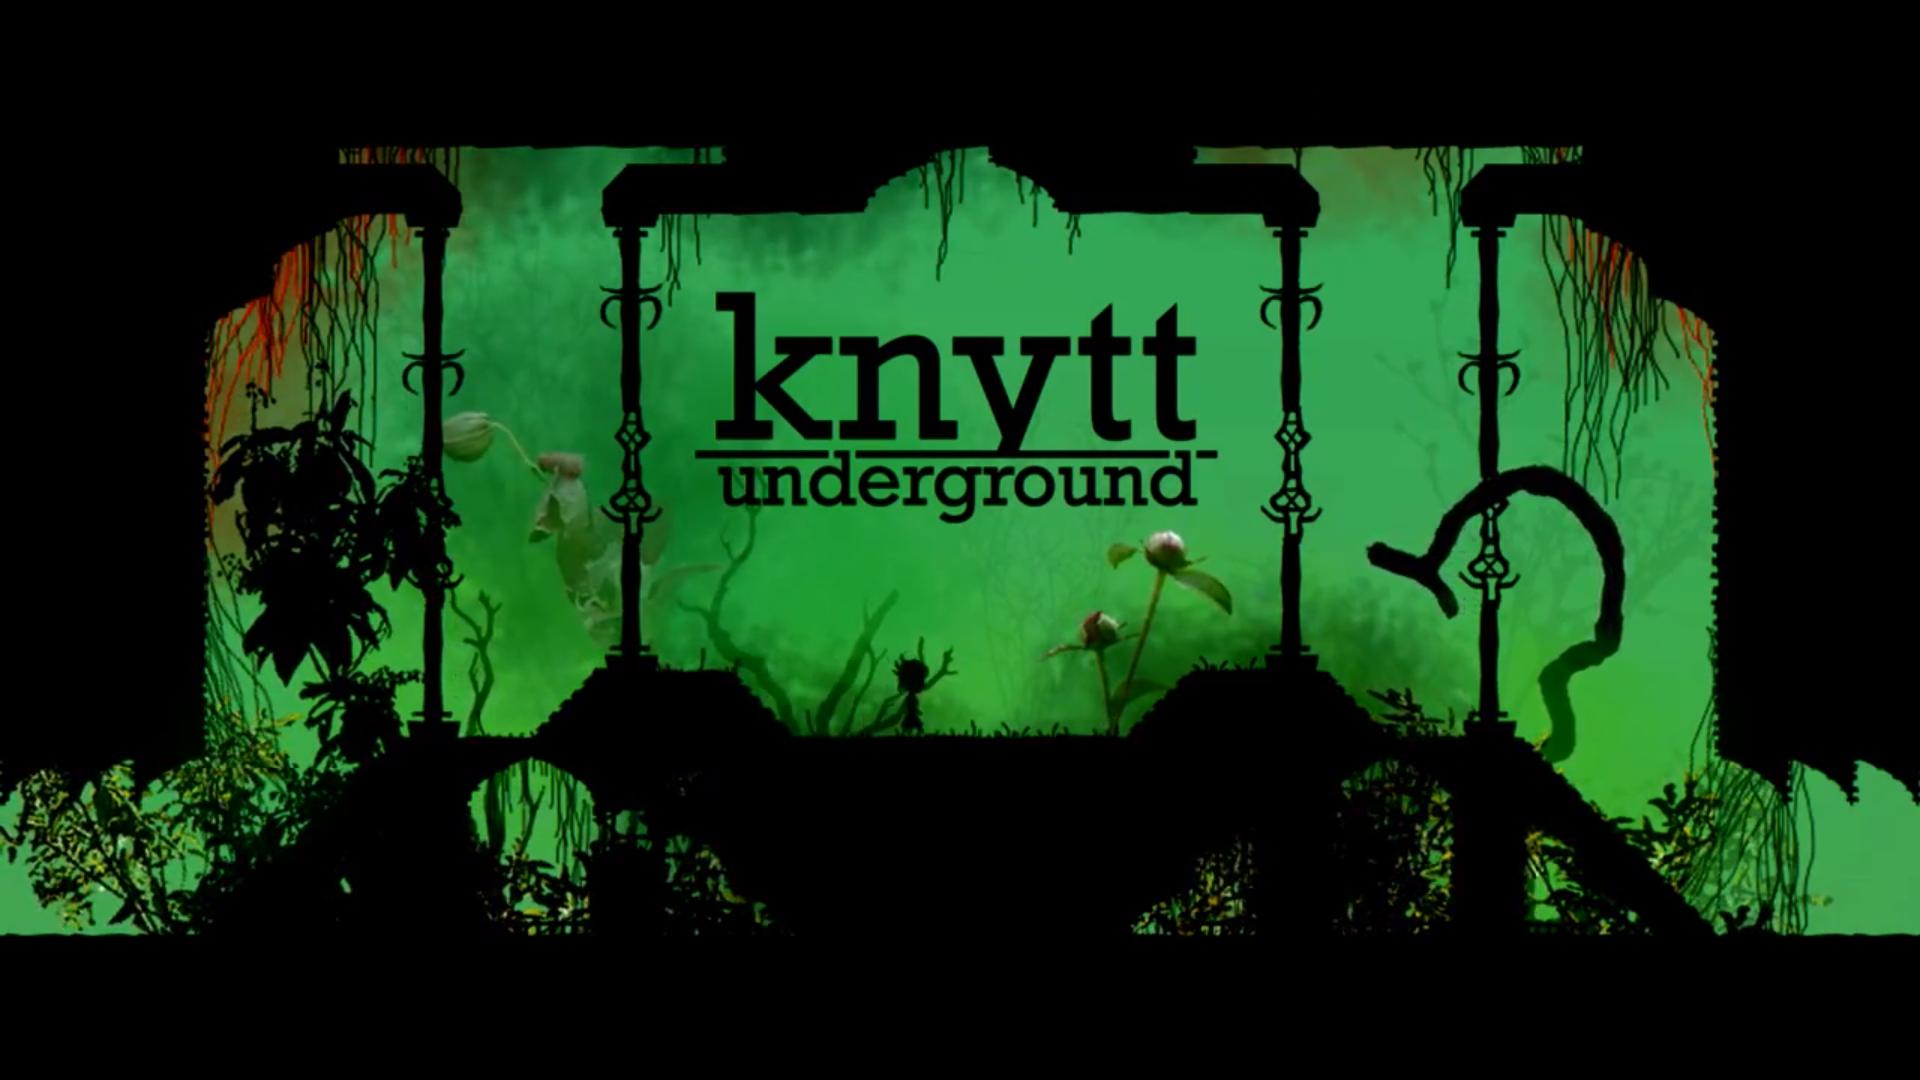 PR: Knytt Underground Coming To Wii U This Holiday Season